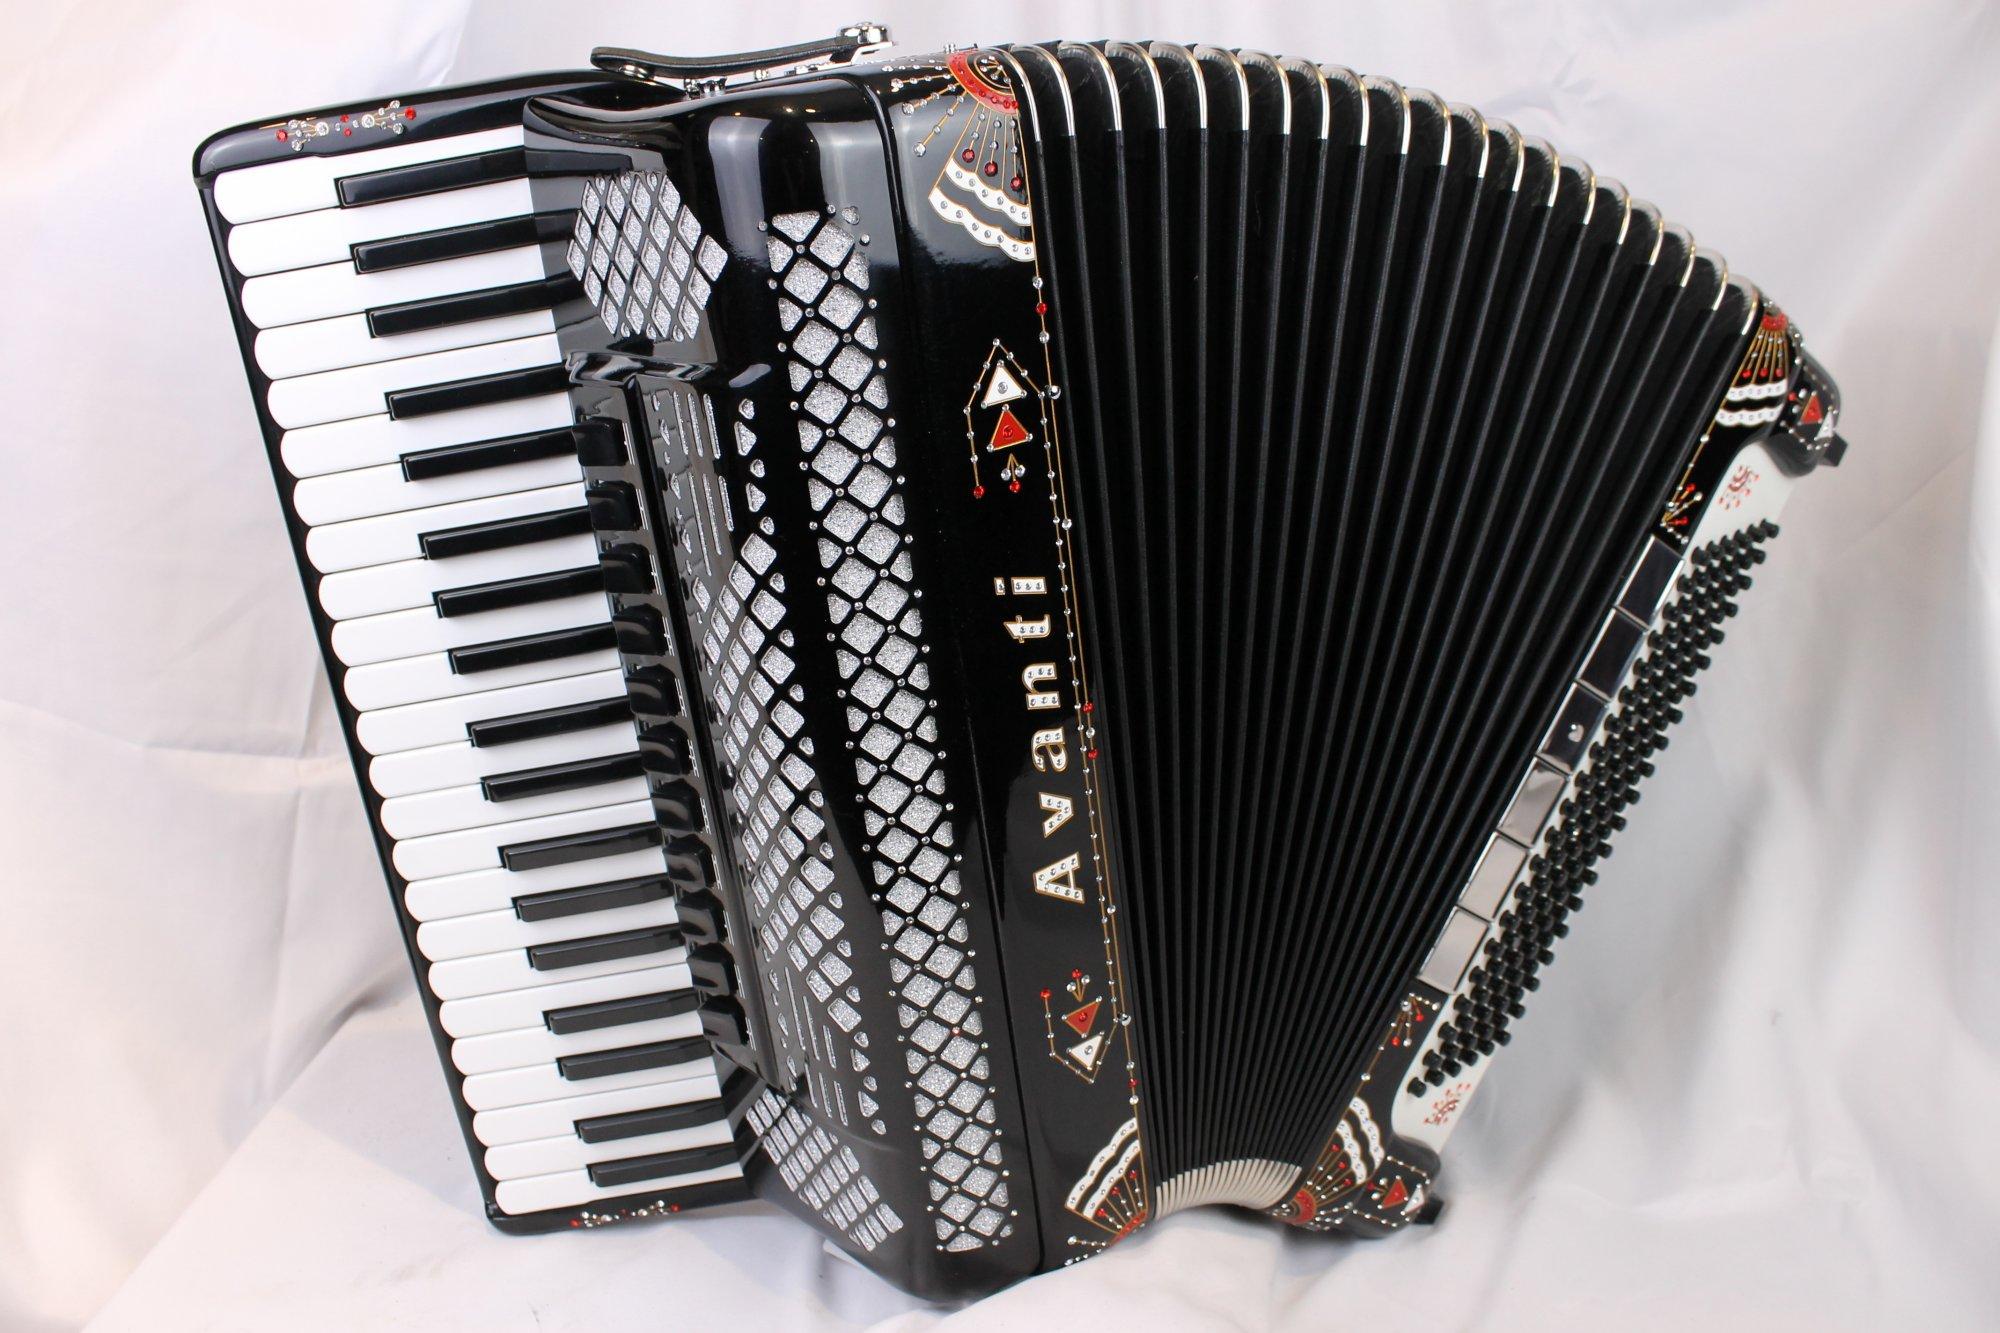 4054 - Like New Decorated Black Avanti Classic (Excelsior 911) Piano Accordion LMMM 41 120